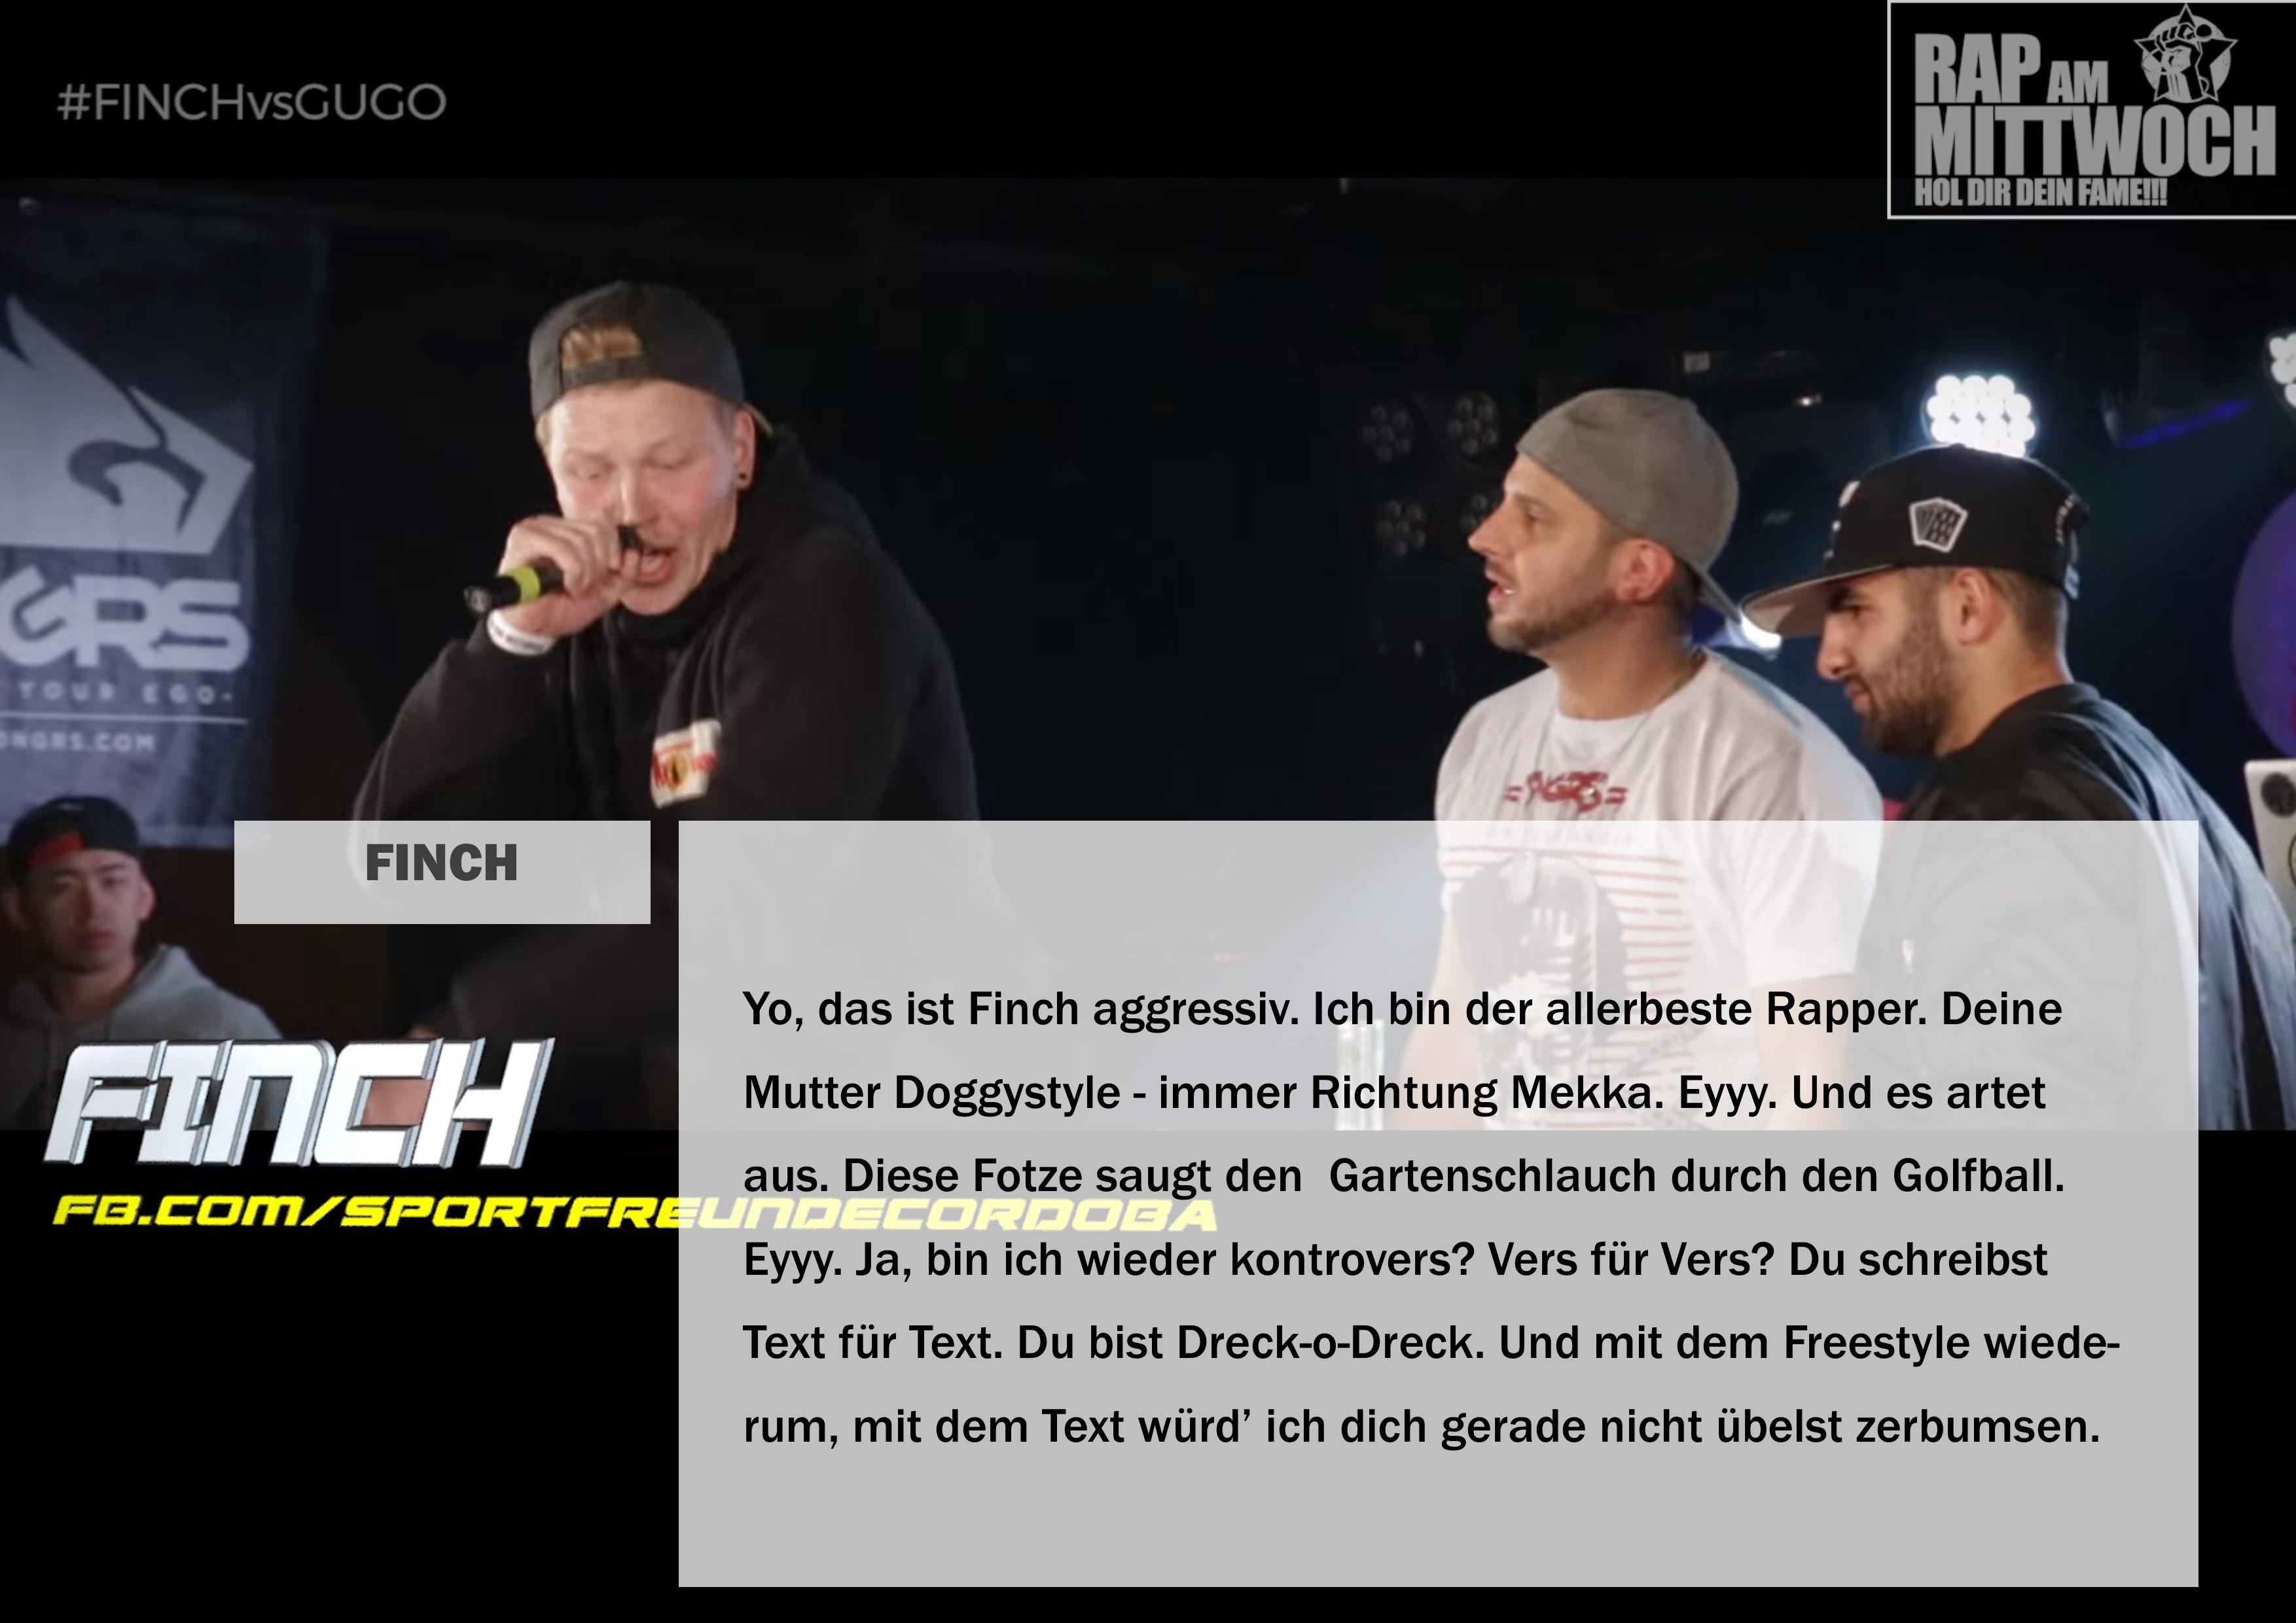 Gugo-vs-Finch-4-1